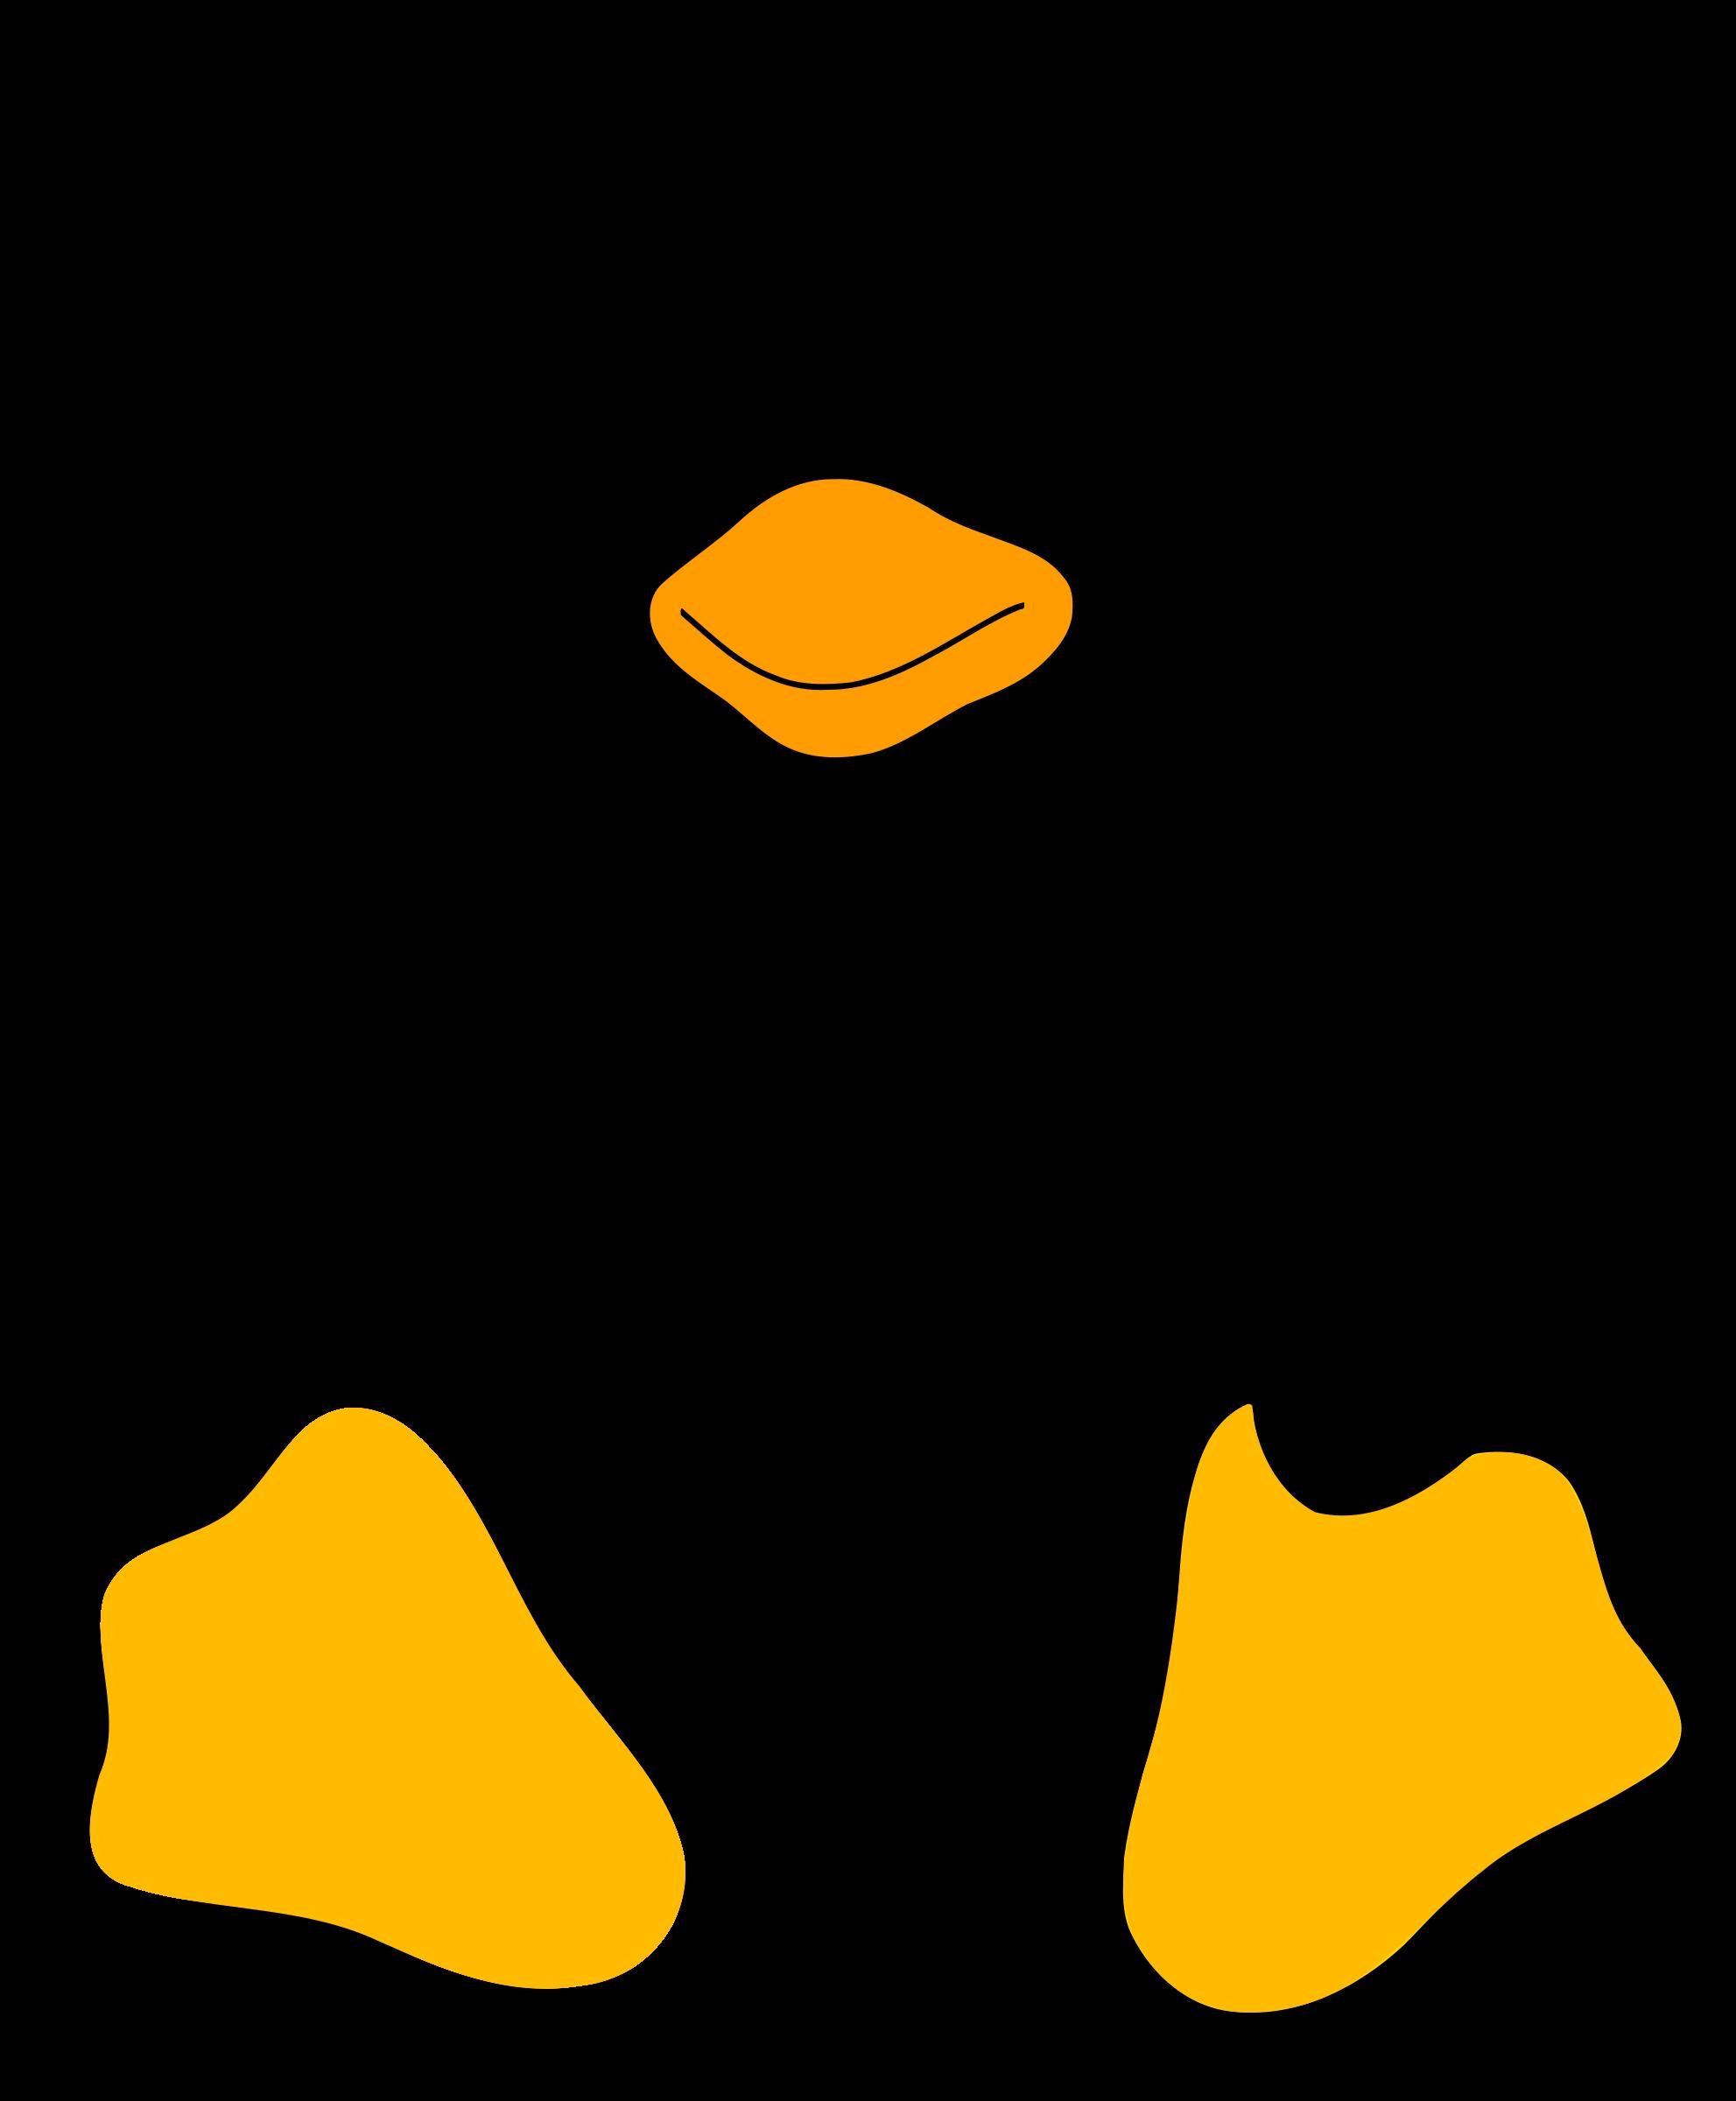 Linux the parody wiki. Penguin clipart profile